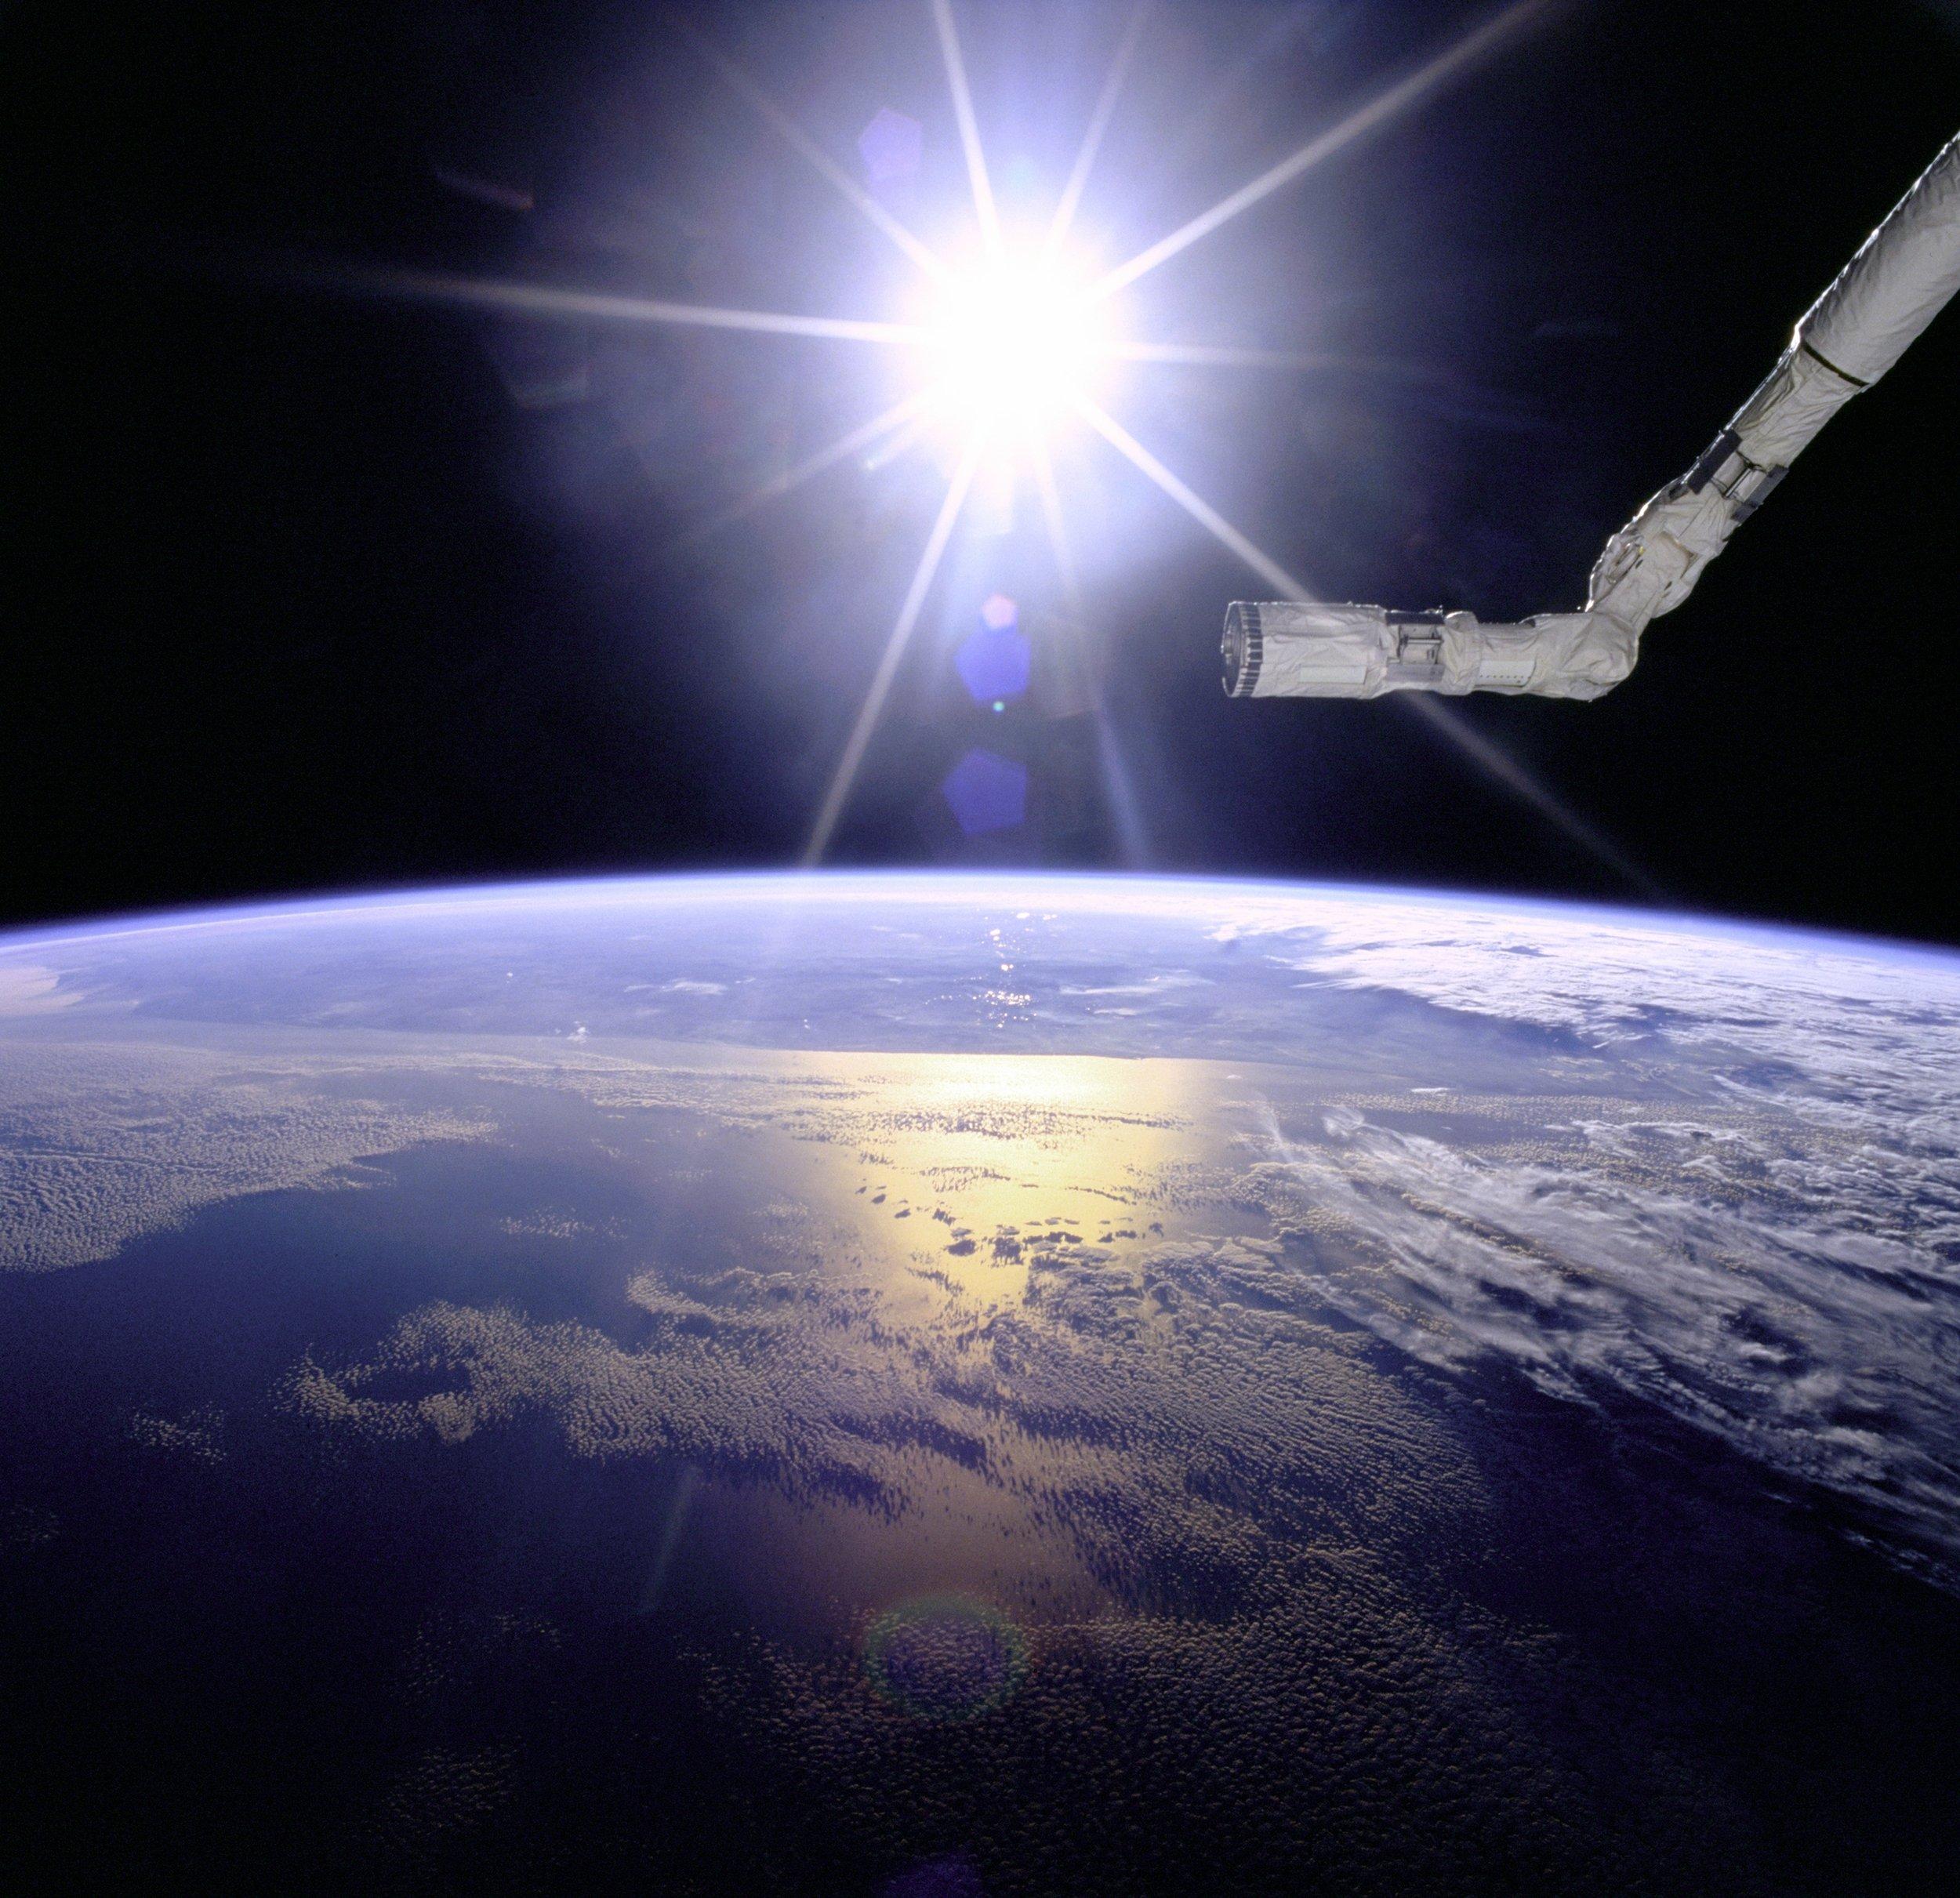 Free Images : ocean, sun, vehicle, aviation, night sky, nasa